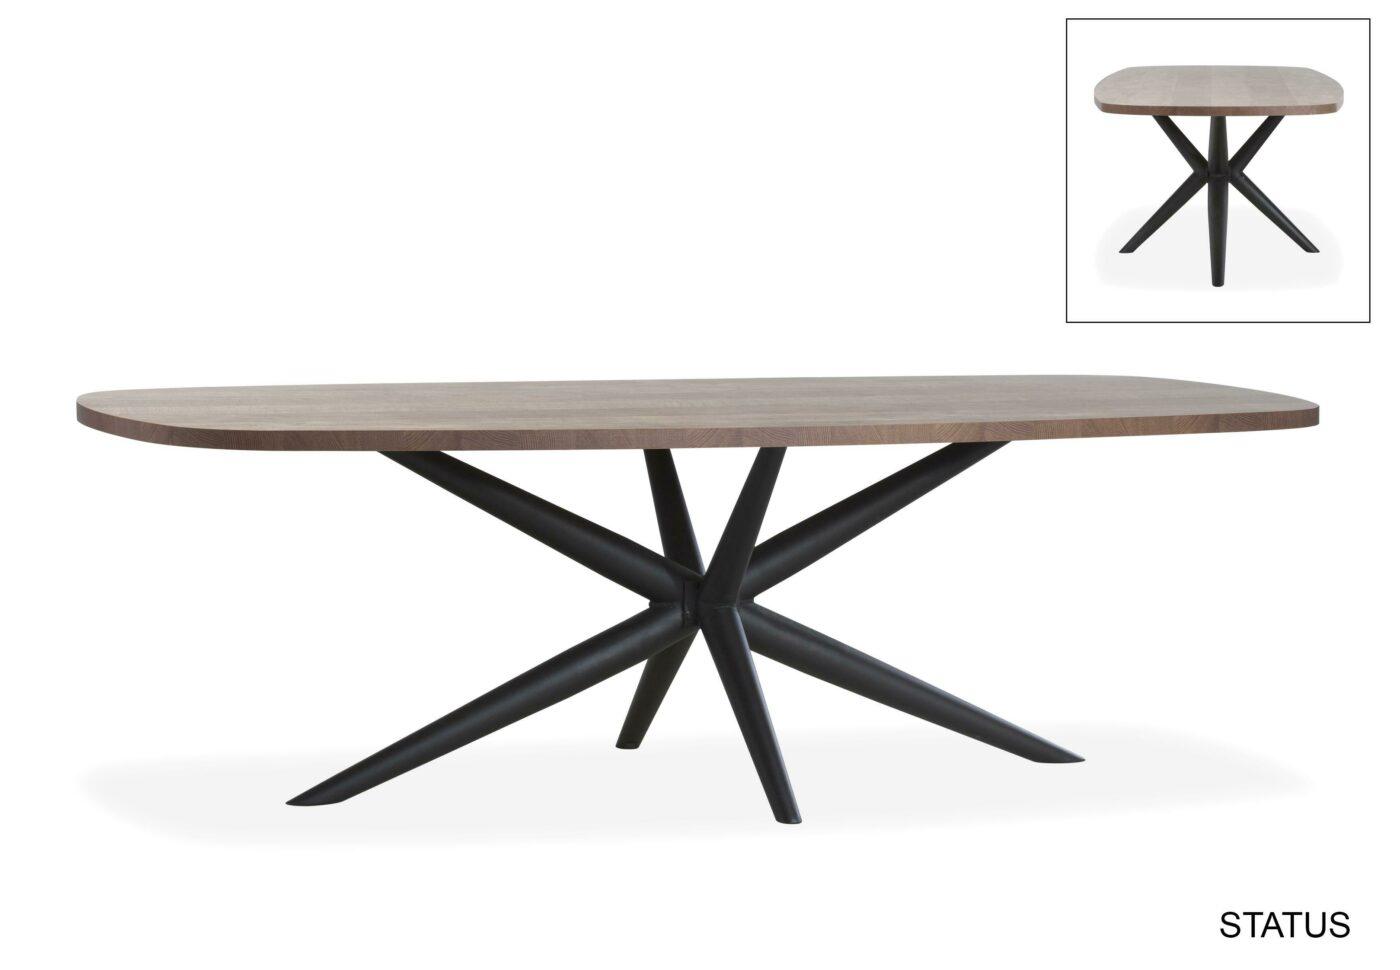 Status tafel